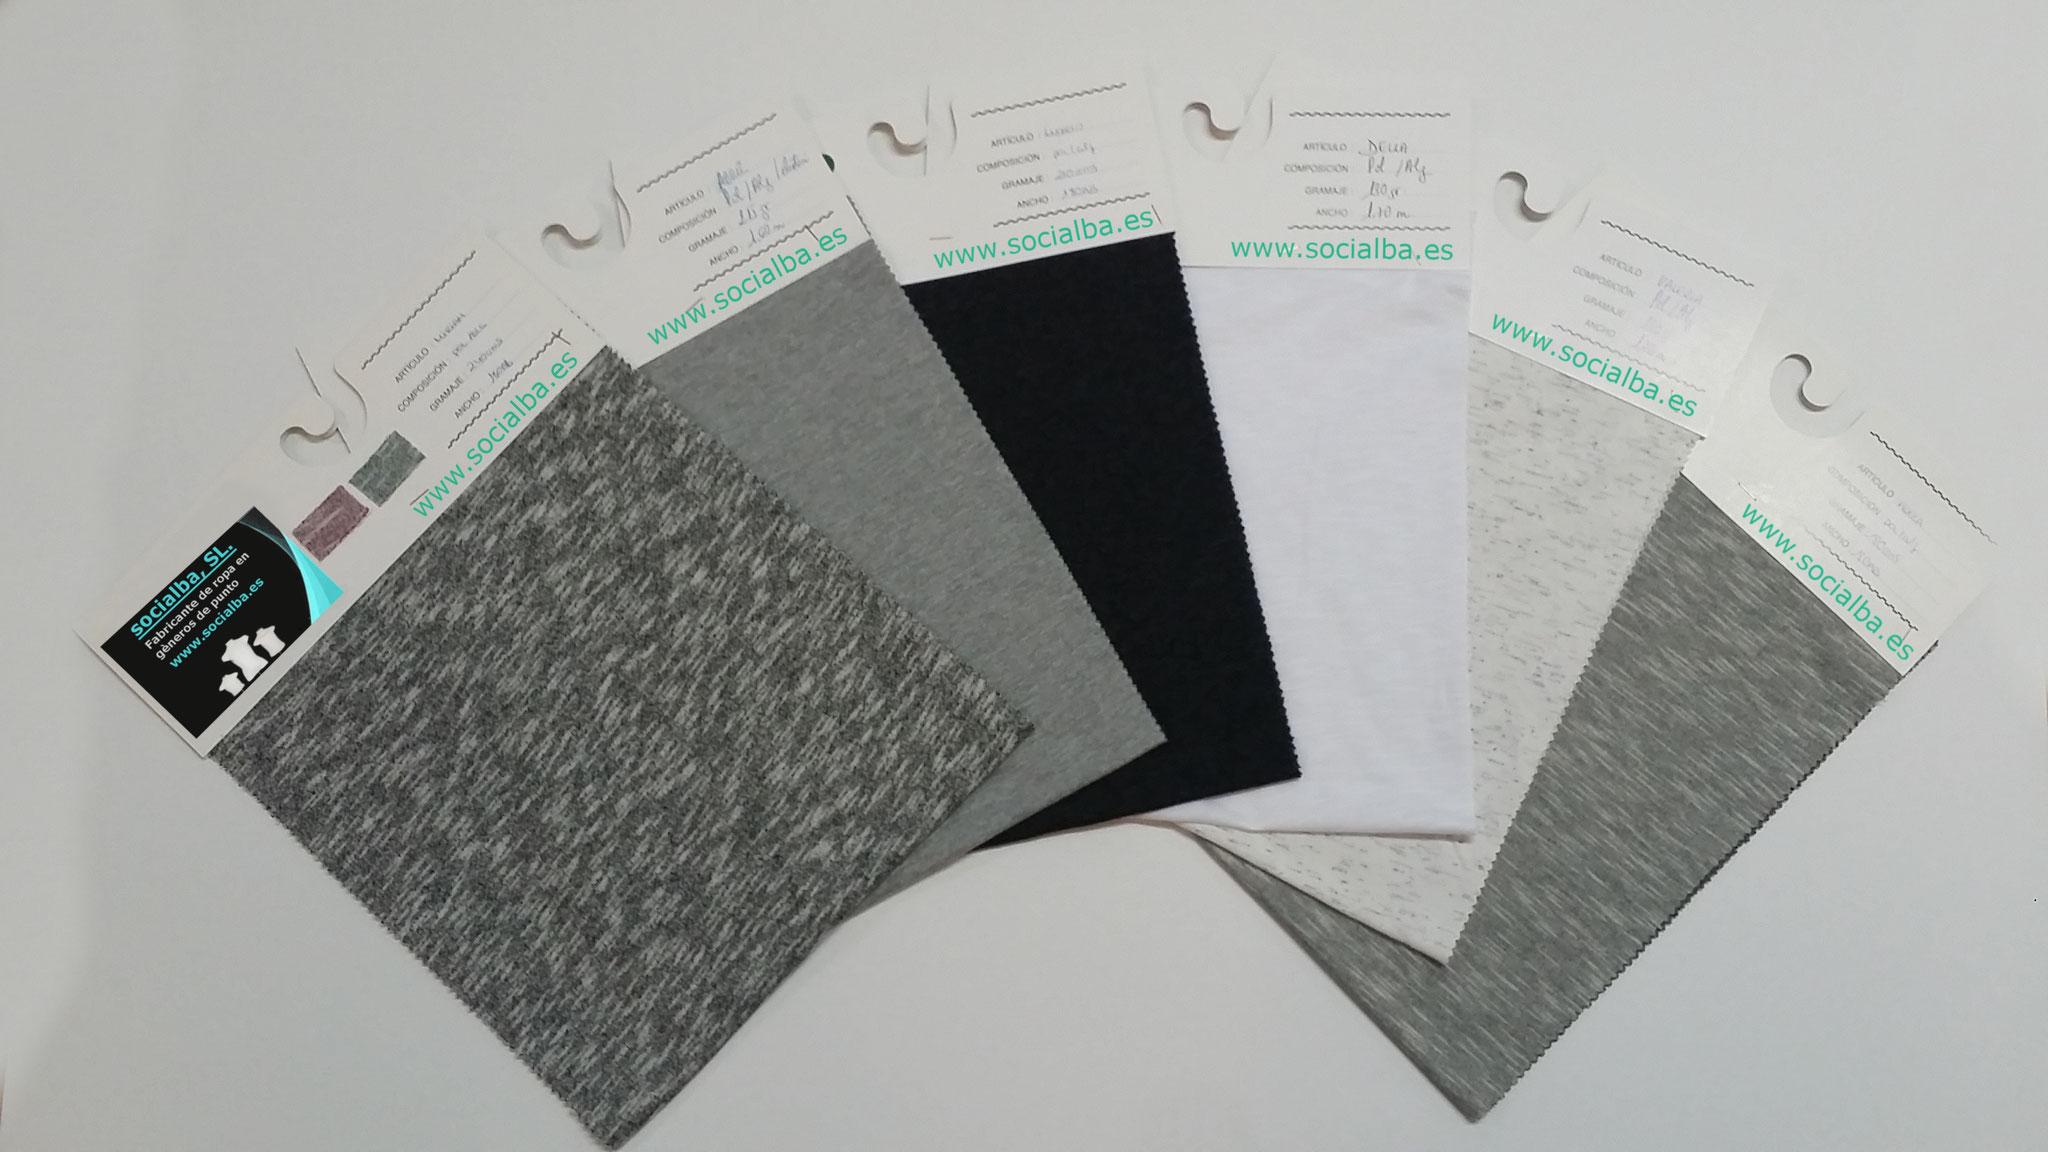 Tejidos sostenibles, tela ecológica, algodón orgánico